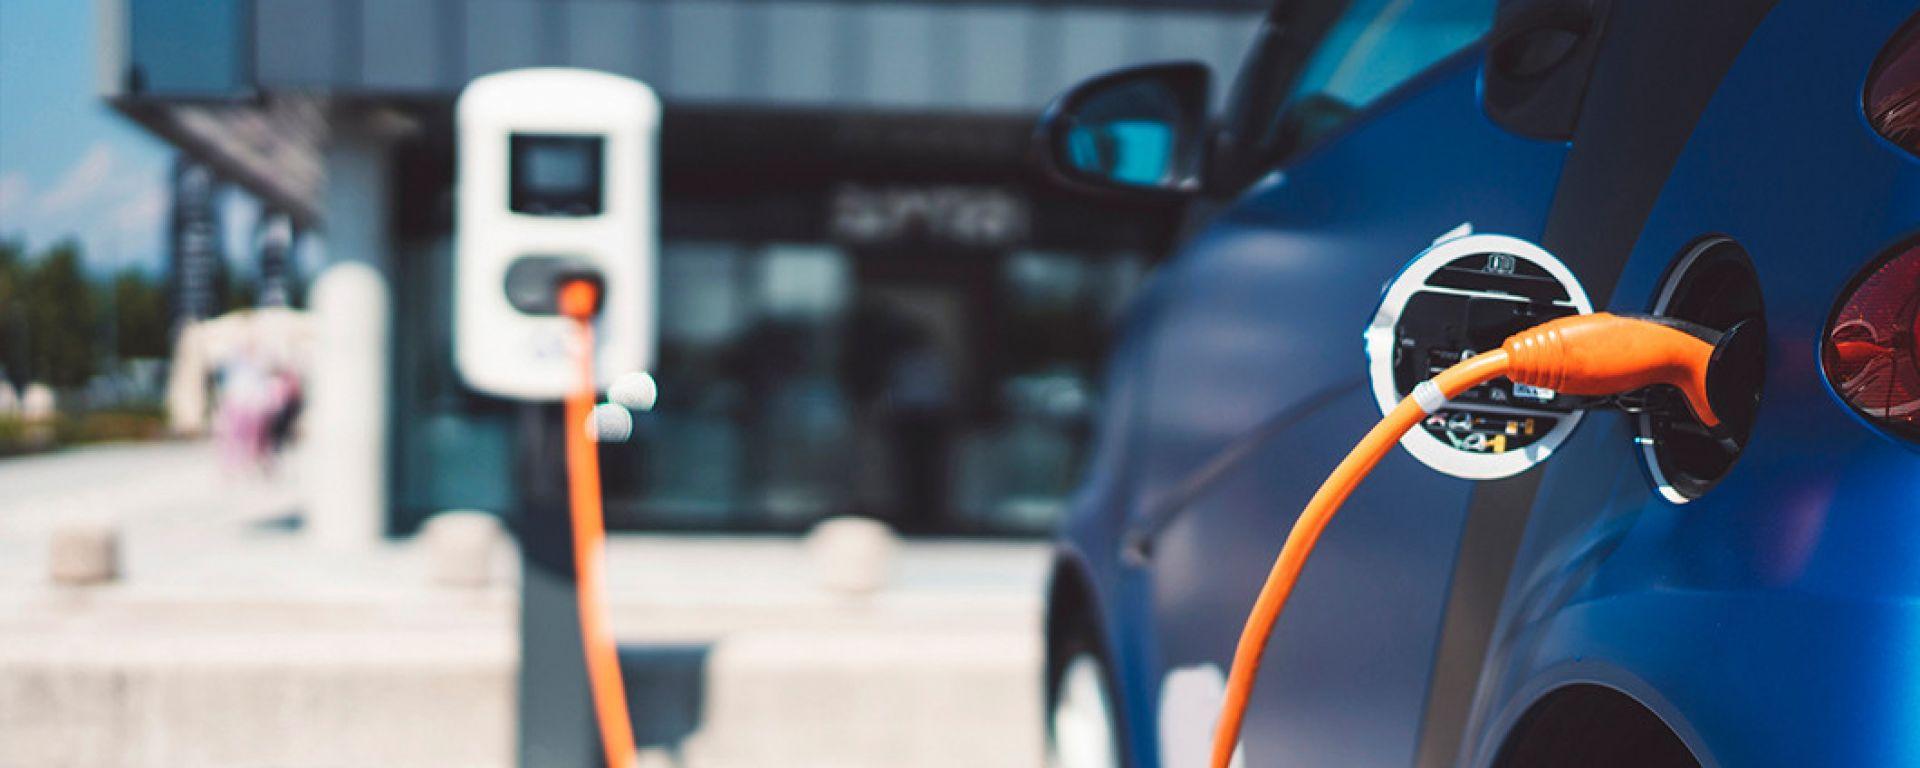 Ecobonus auto, nuovi fondi per le auto a basse emissioni